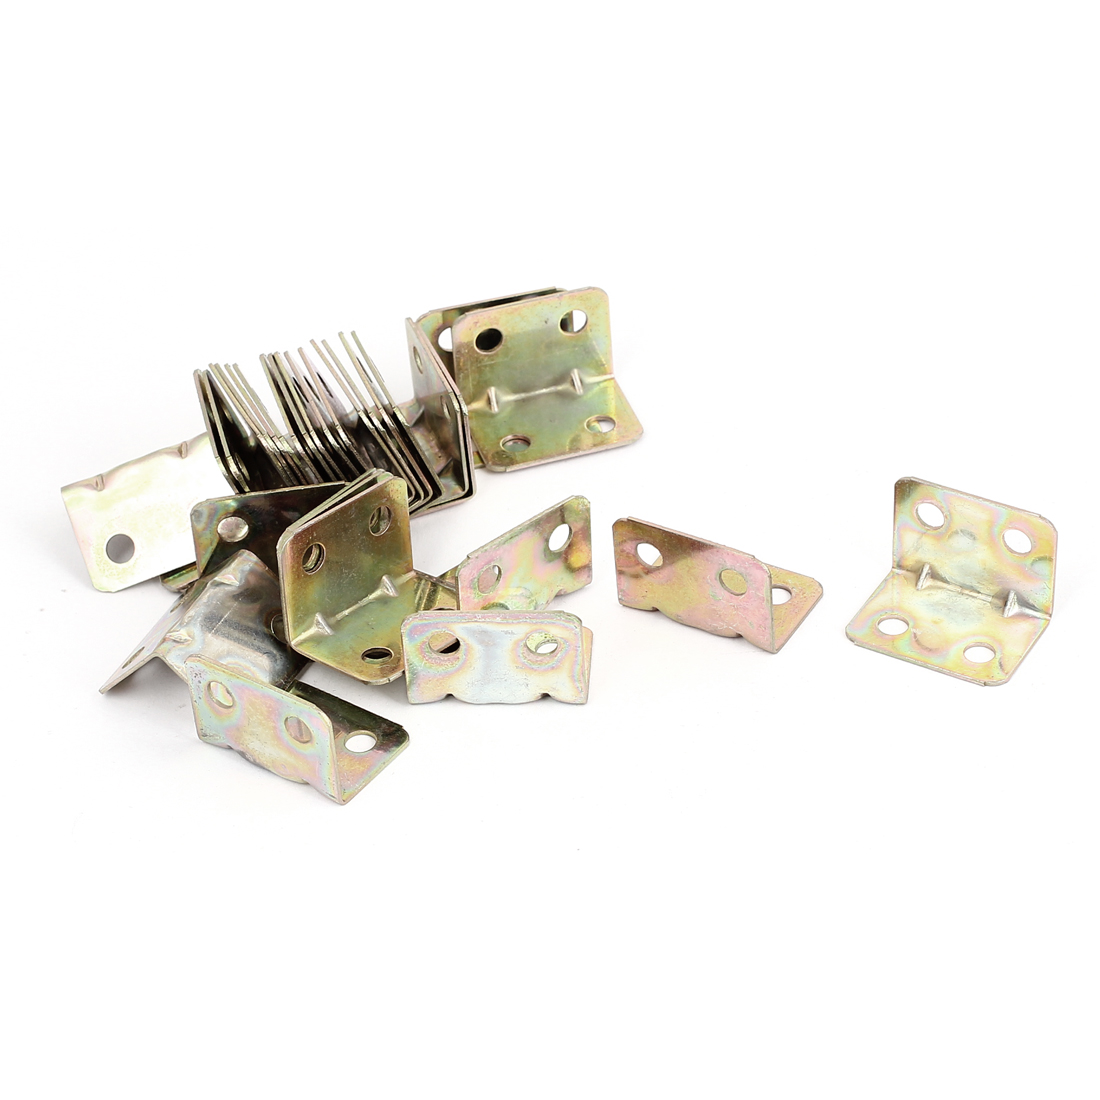 20mmx20mm L Shape Shelf Corner Brace Plate Right Angle Bracket Bronze Tone 30pcs